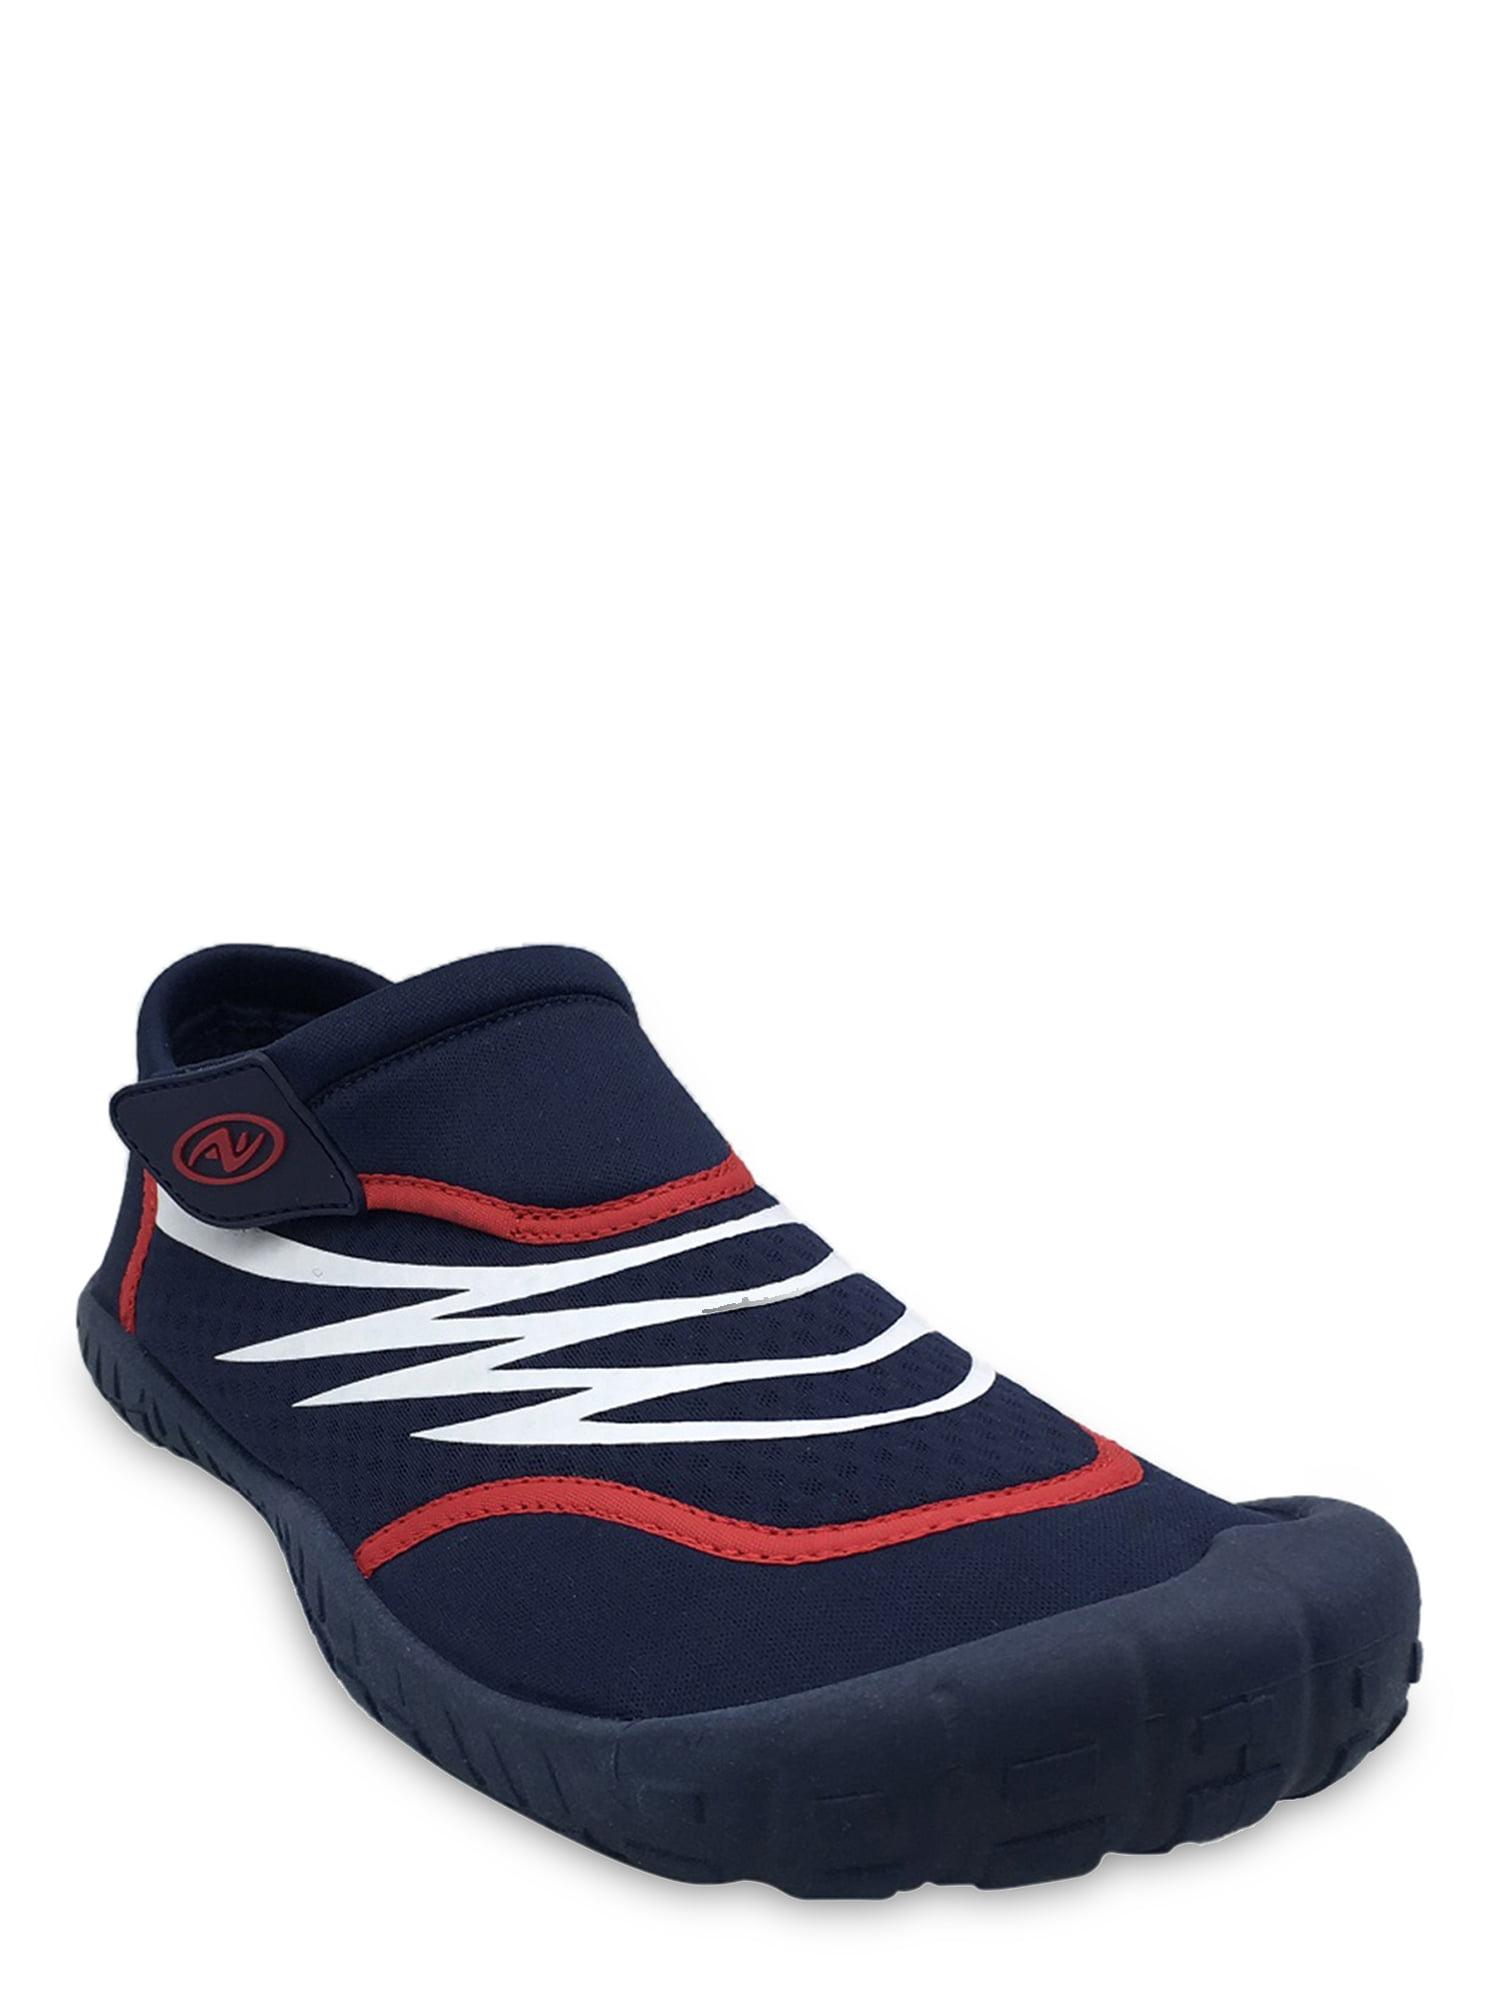 Athletic Works Men's Water Shoe